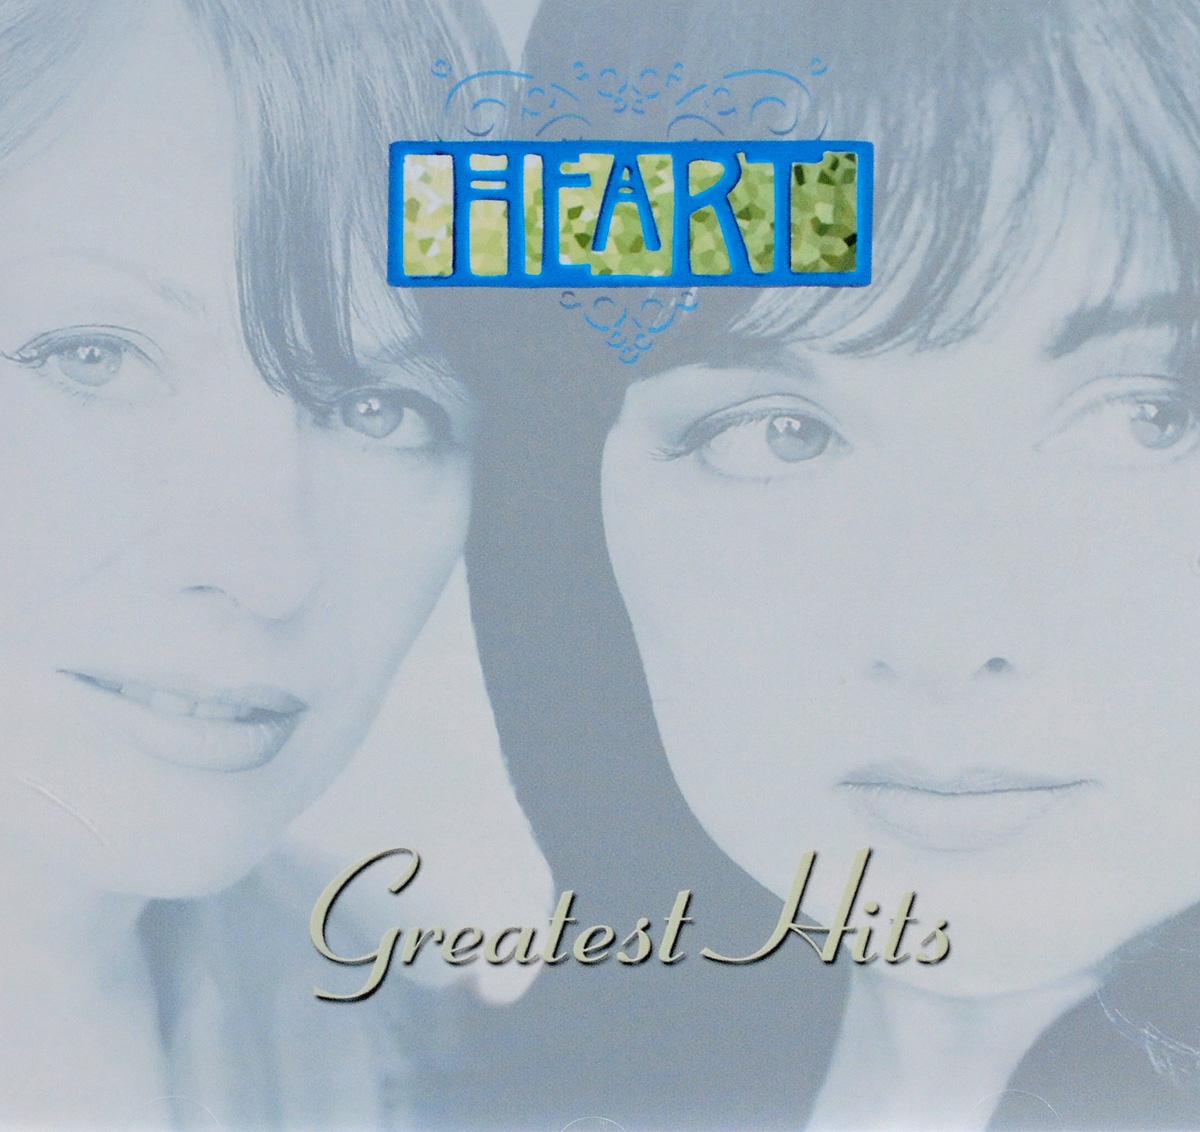 Heart Heart. Greatest Hits. 1985-1995 heart heart greatest hits 1985 1995